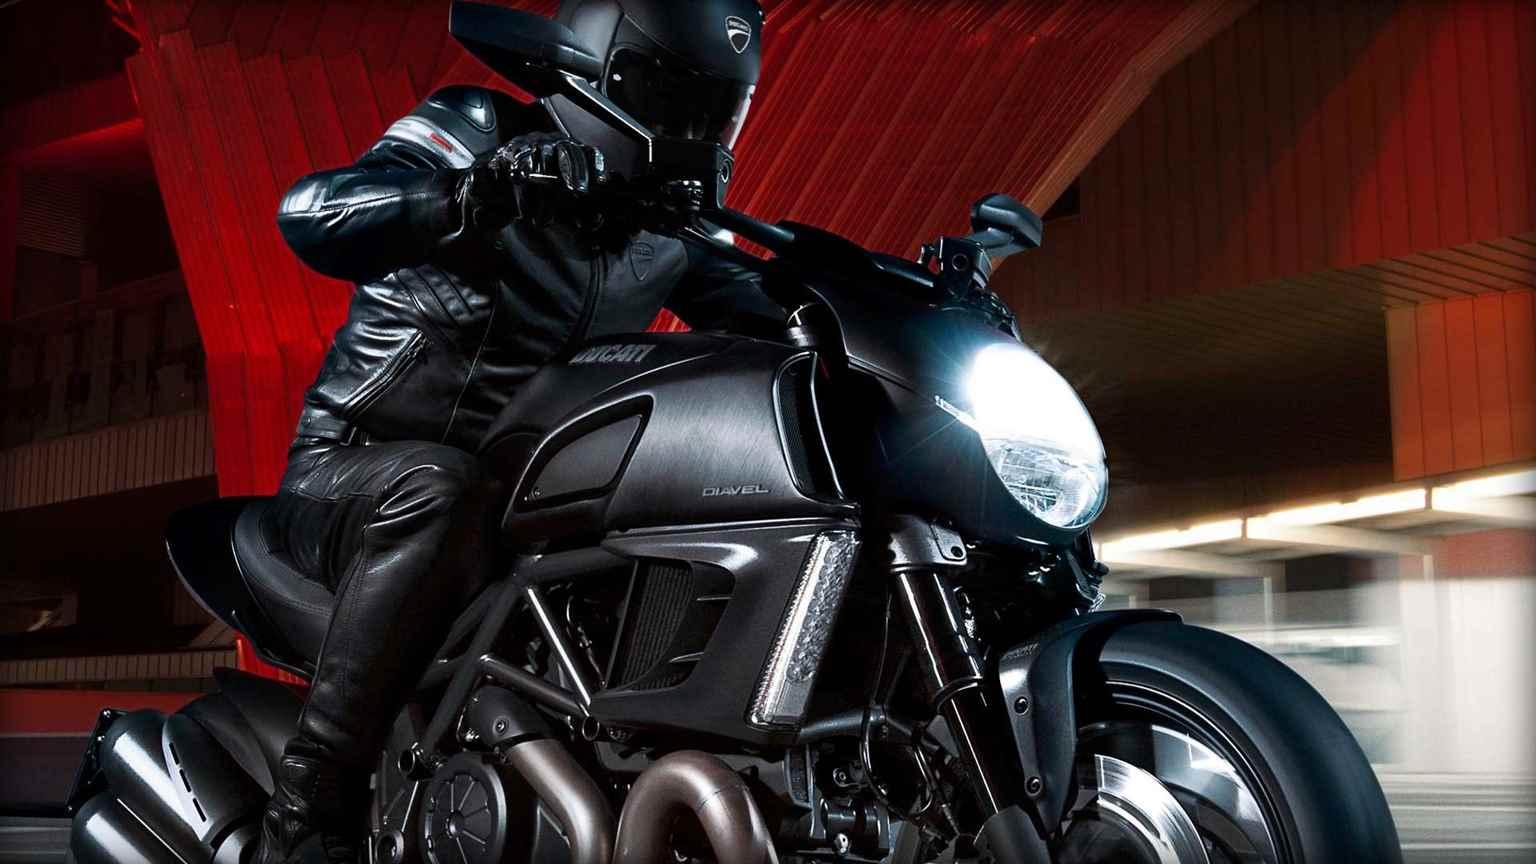 Nova Ducati Diavel